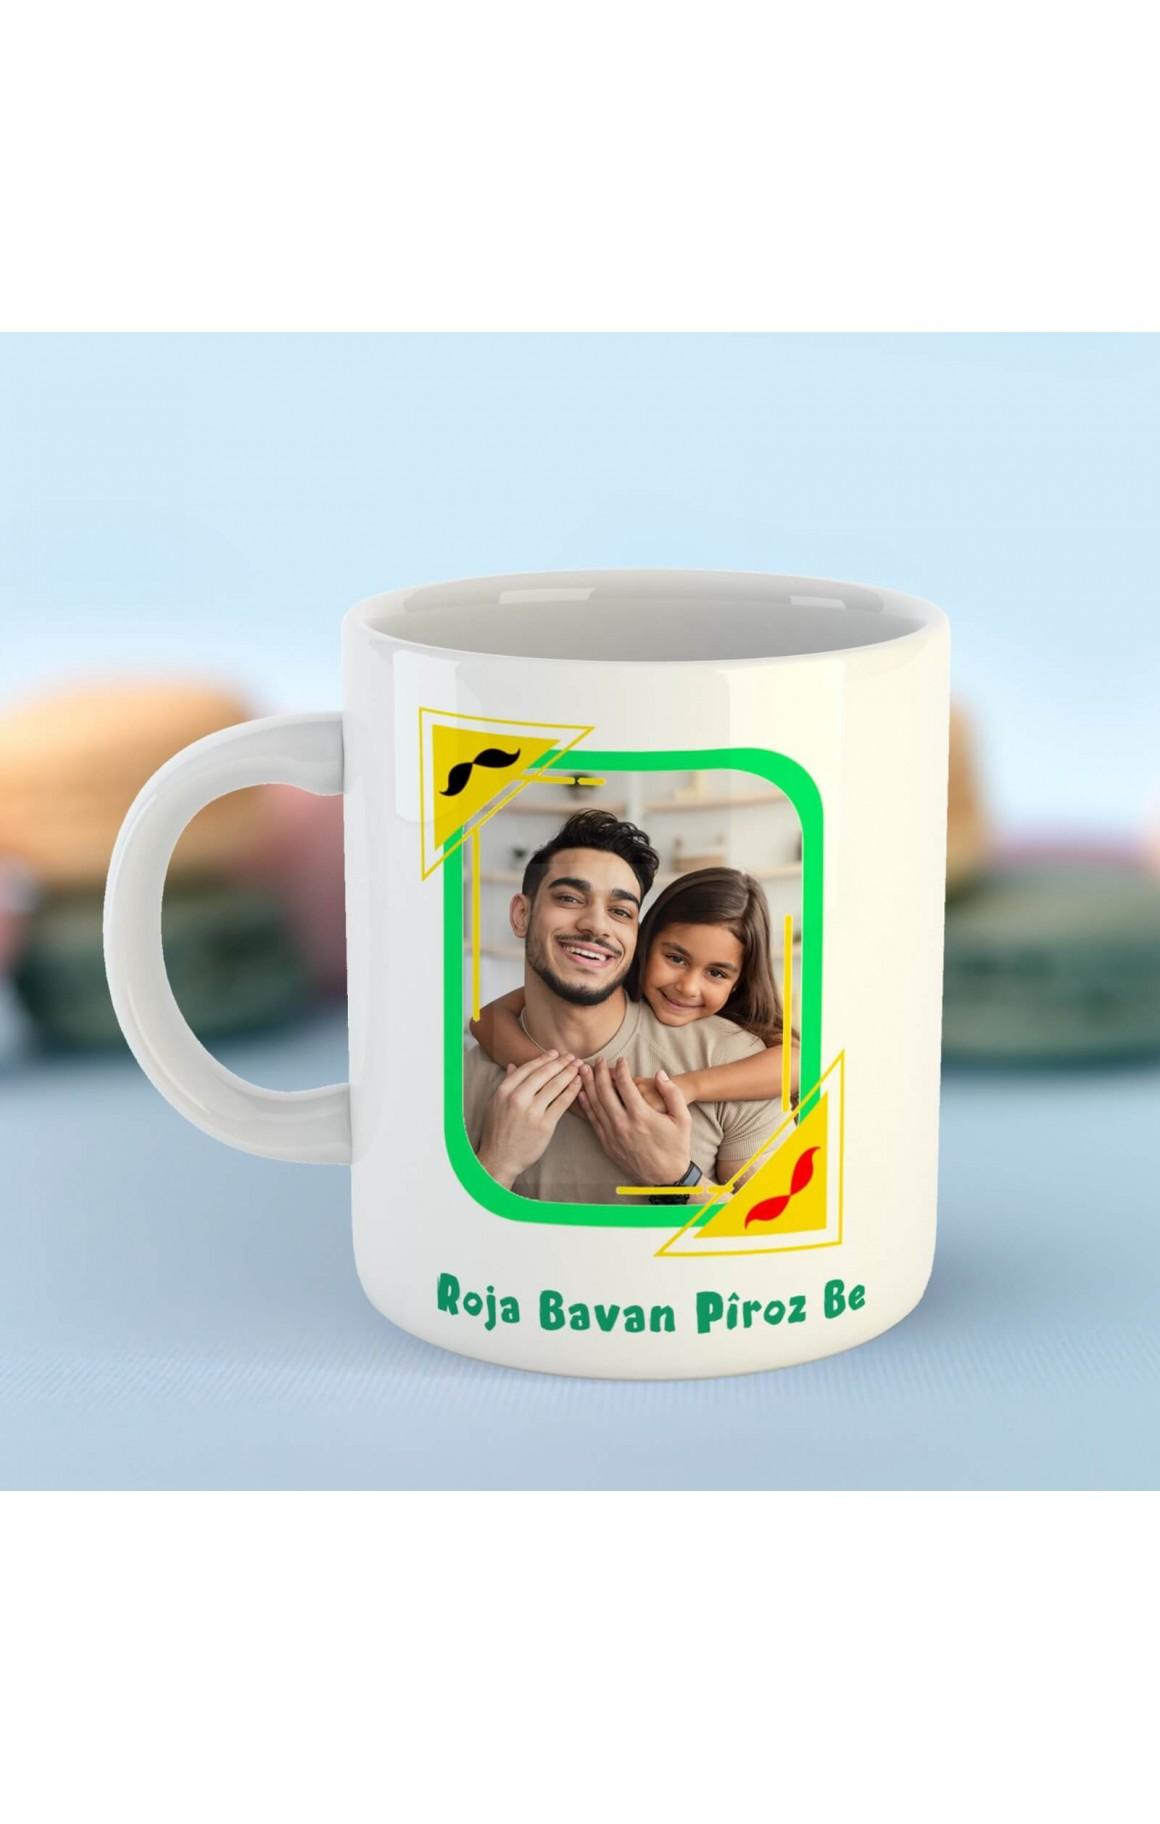 Babalara Özel Resimli Porselen Kupa - Roja Bavan Pîroz be